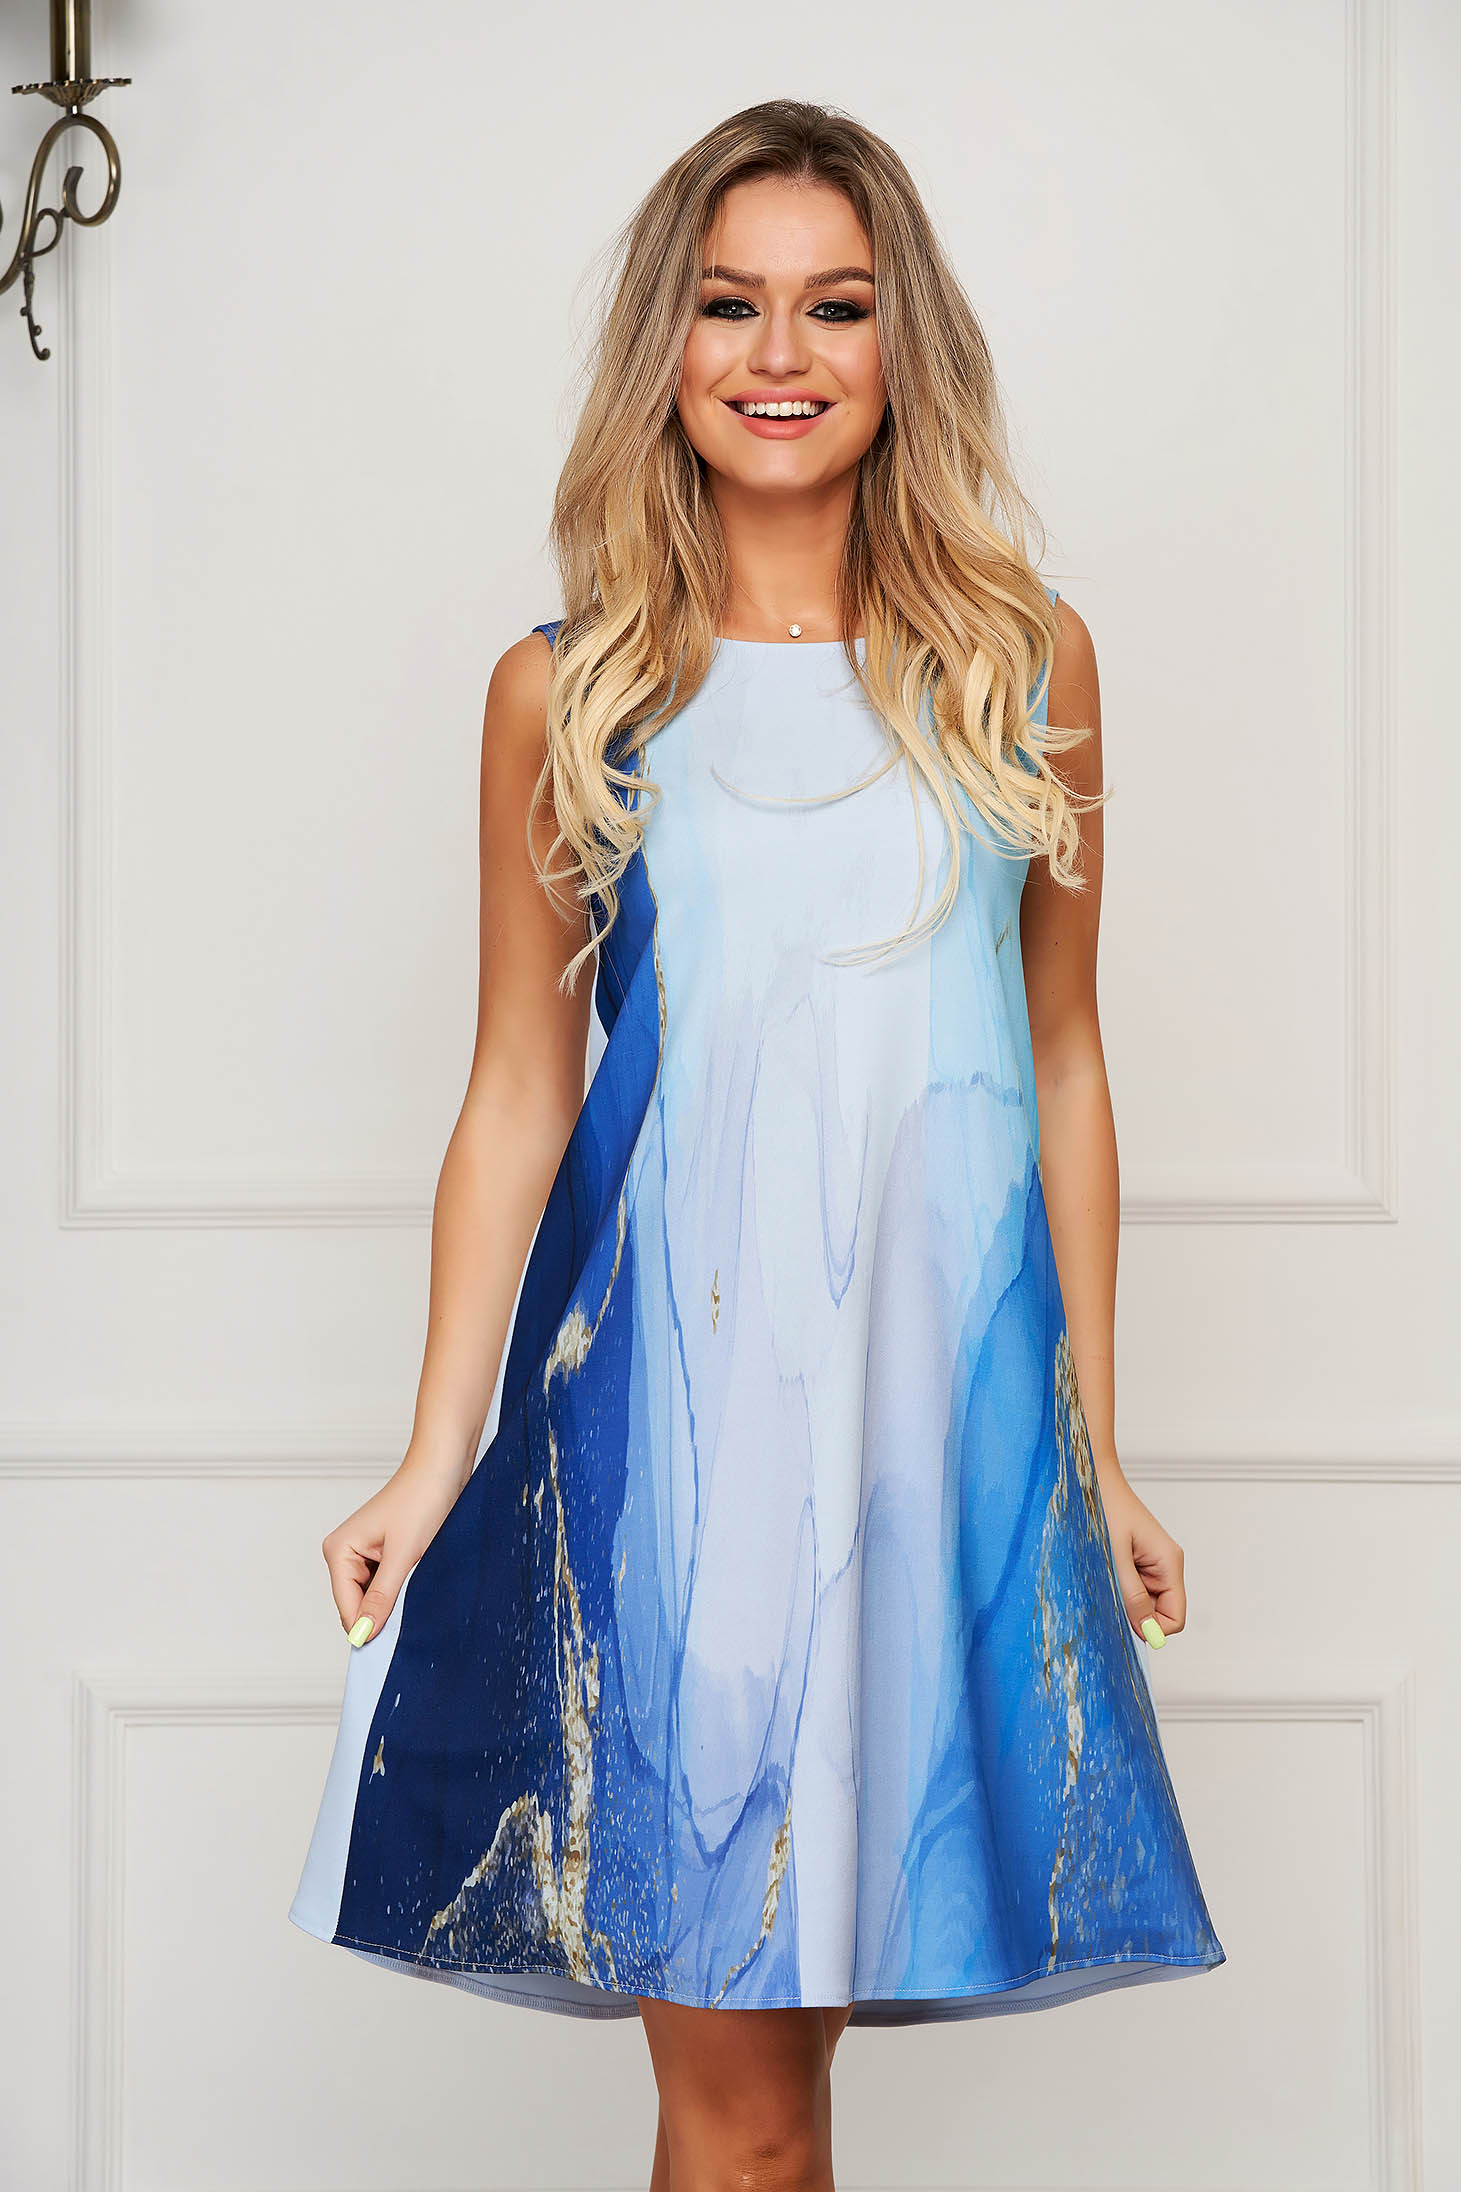 Rochie StarShinerS albastra-deschis de zi scurta cu croi larg din stofa subtire usor elastica